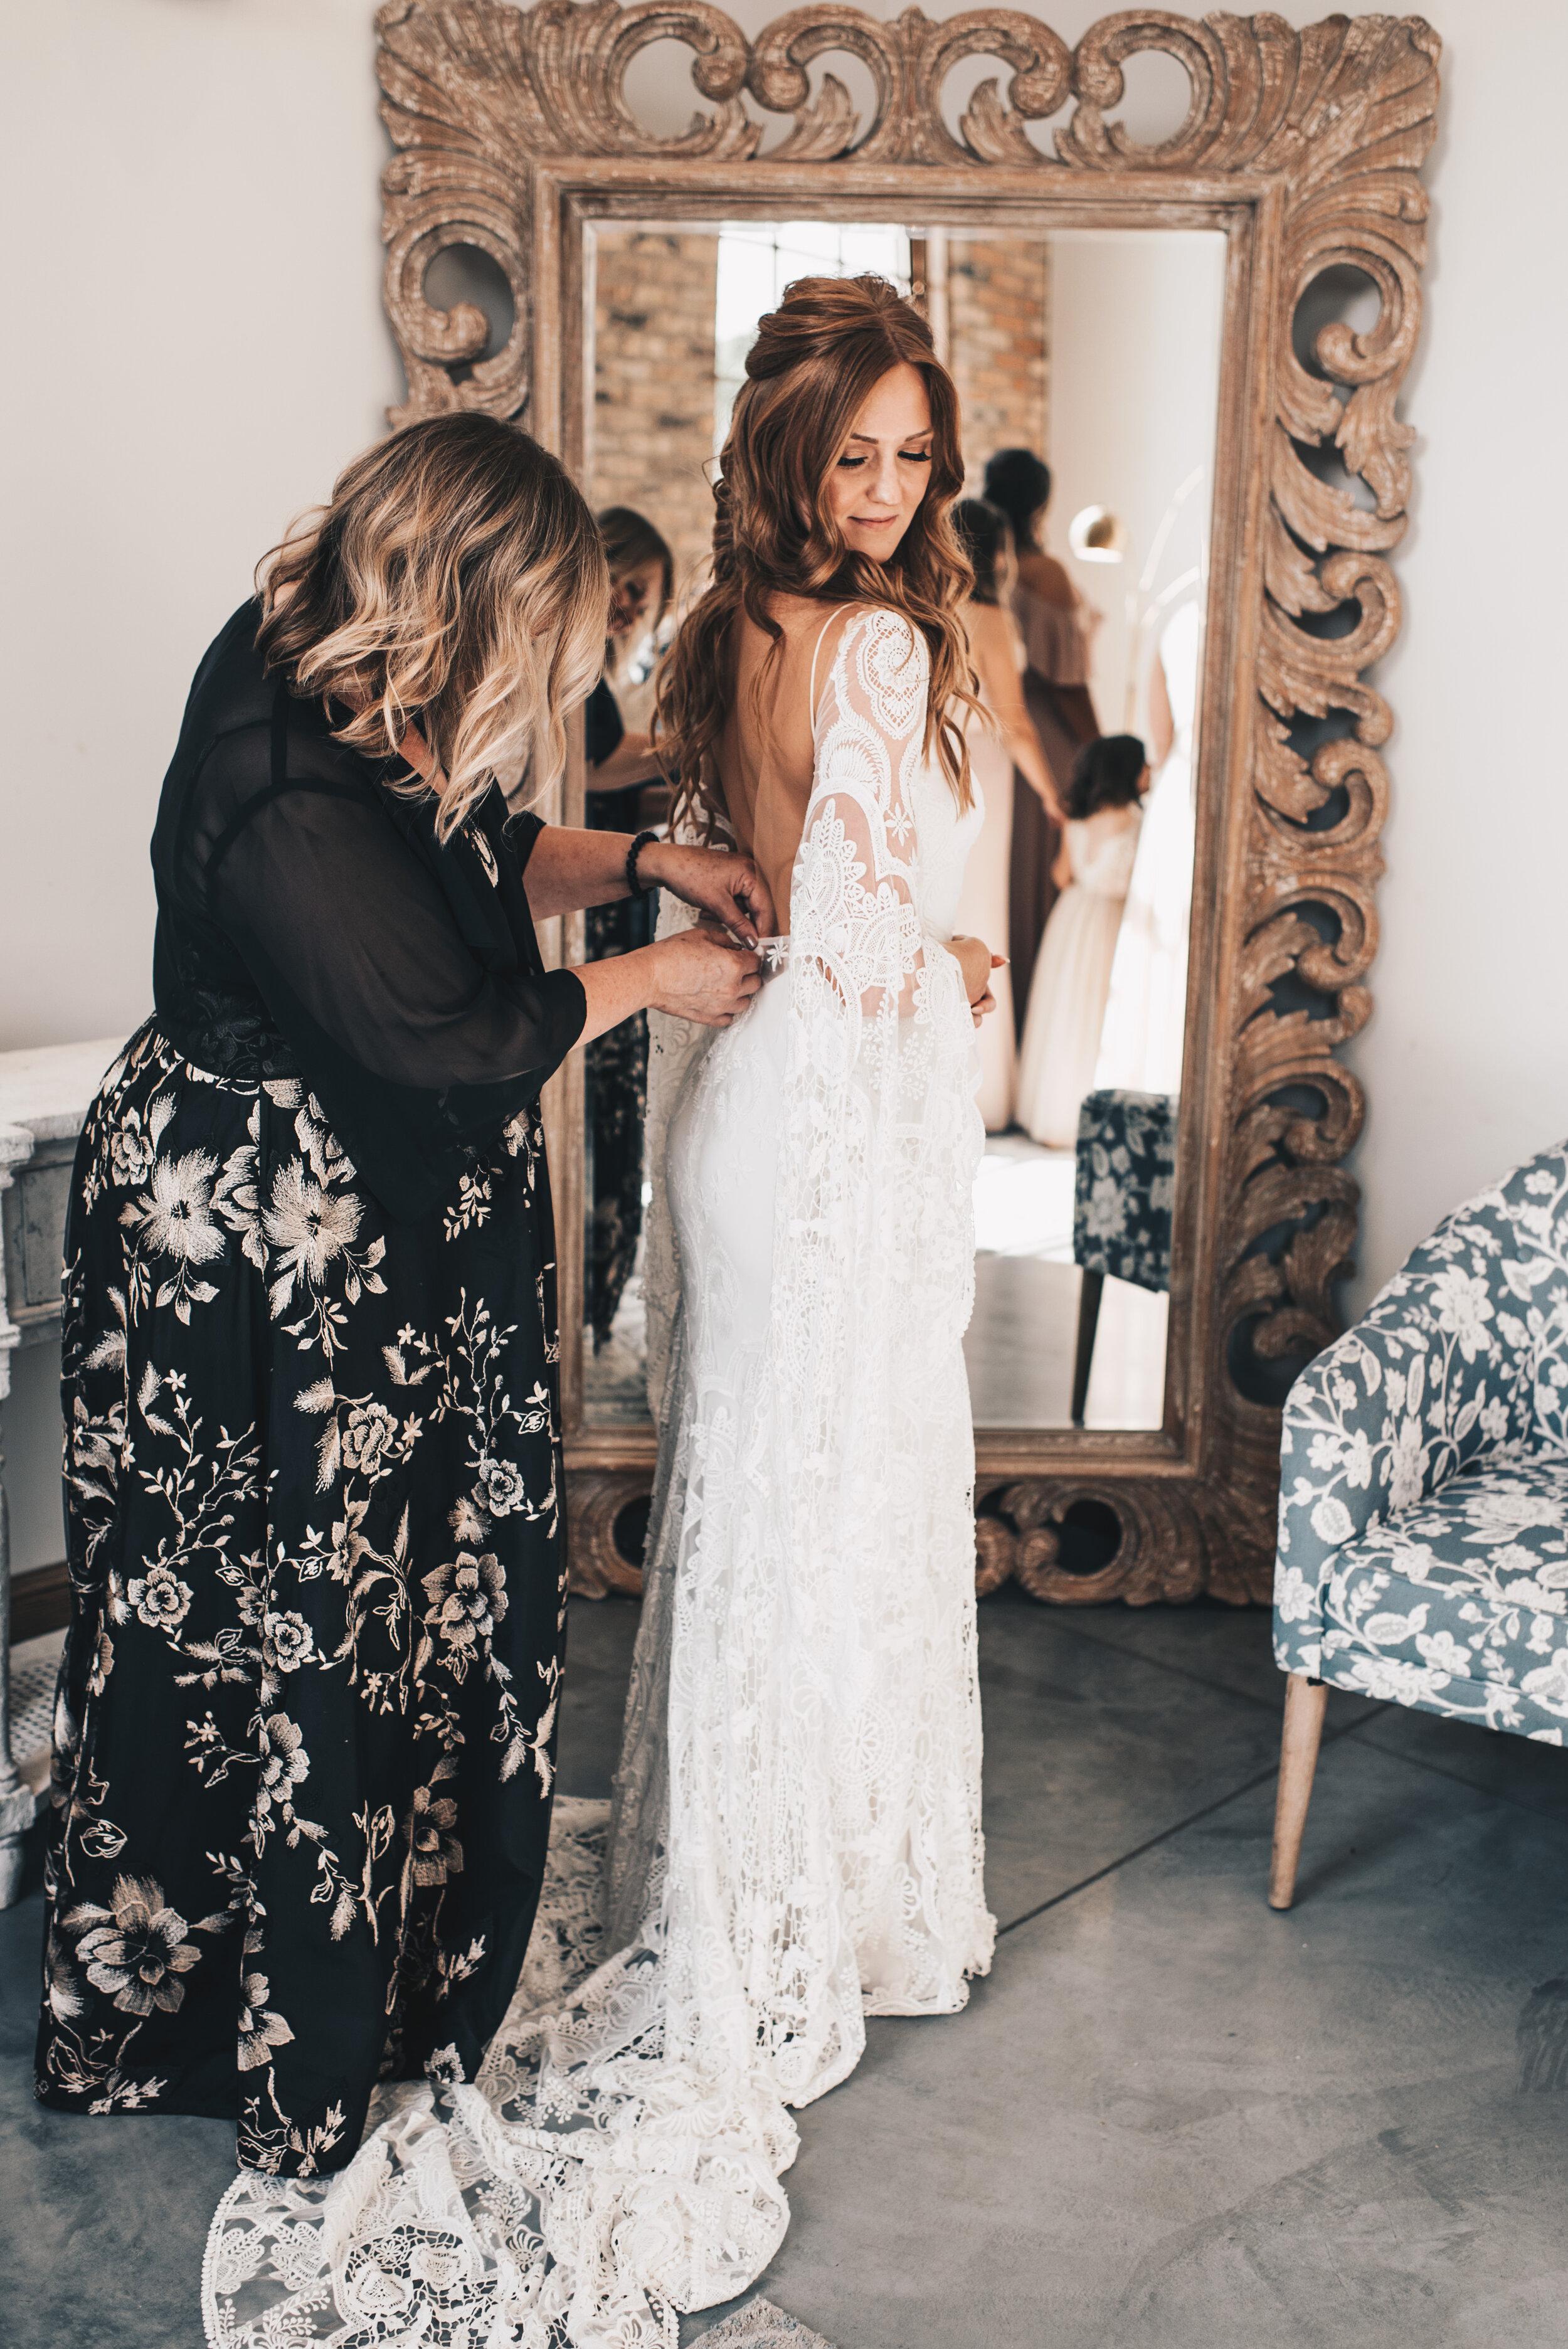 Modern Industrial Wedding, The Brix on the Fox, The BRIX, Wedding Detail Photos, Modern Midwest Wedding, The Brix on the Fox Wedding, The BRIX Wedding, Bride Getting Ready Photos, Modern Boho Wedding